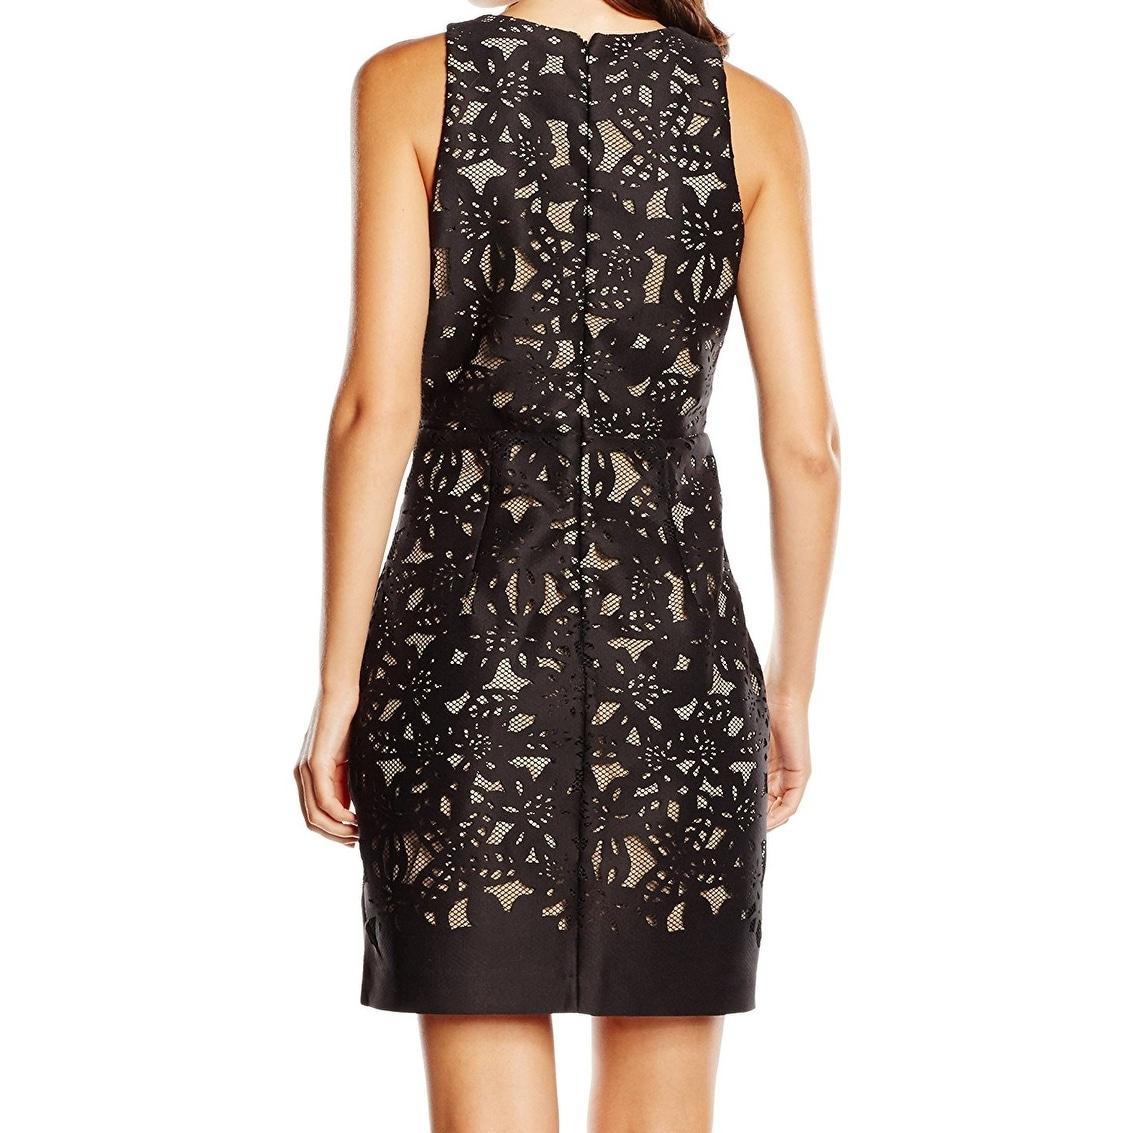 Shop Belle Badgley Mischka NEW Black Womens Size 12 Lasercut Sheath ...